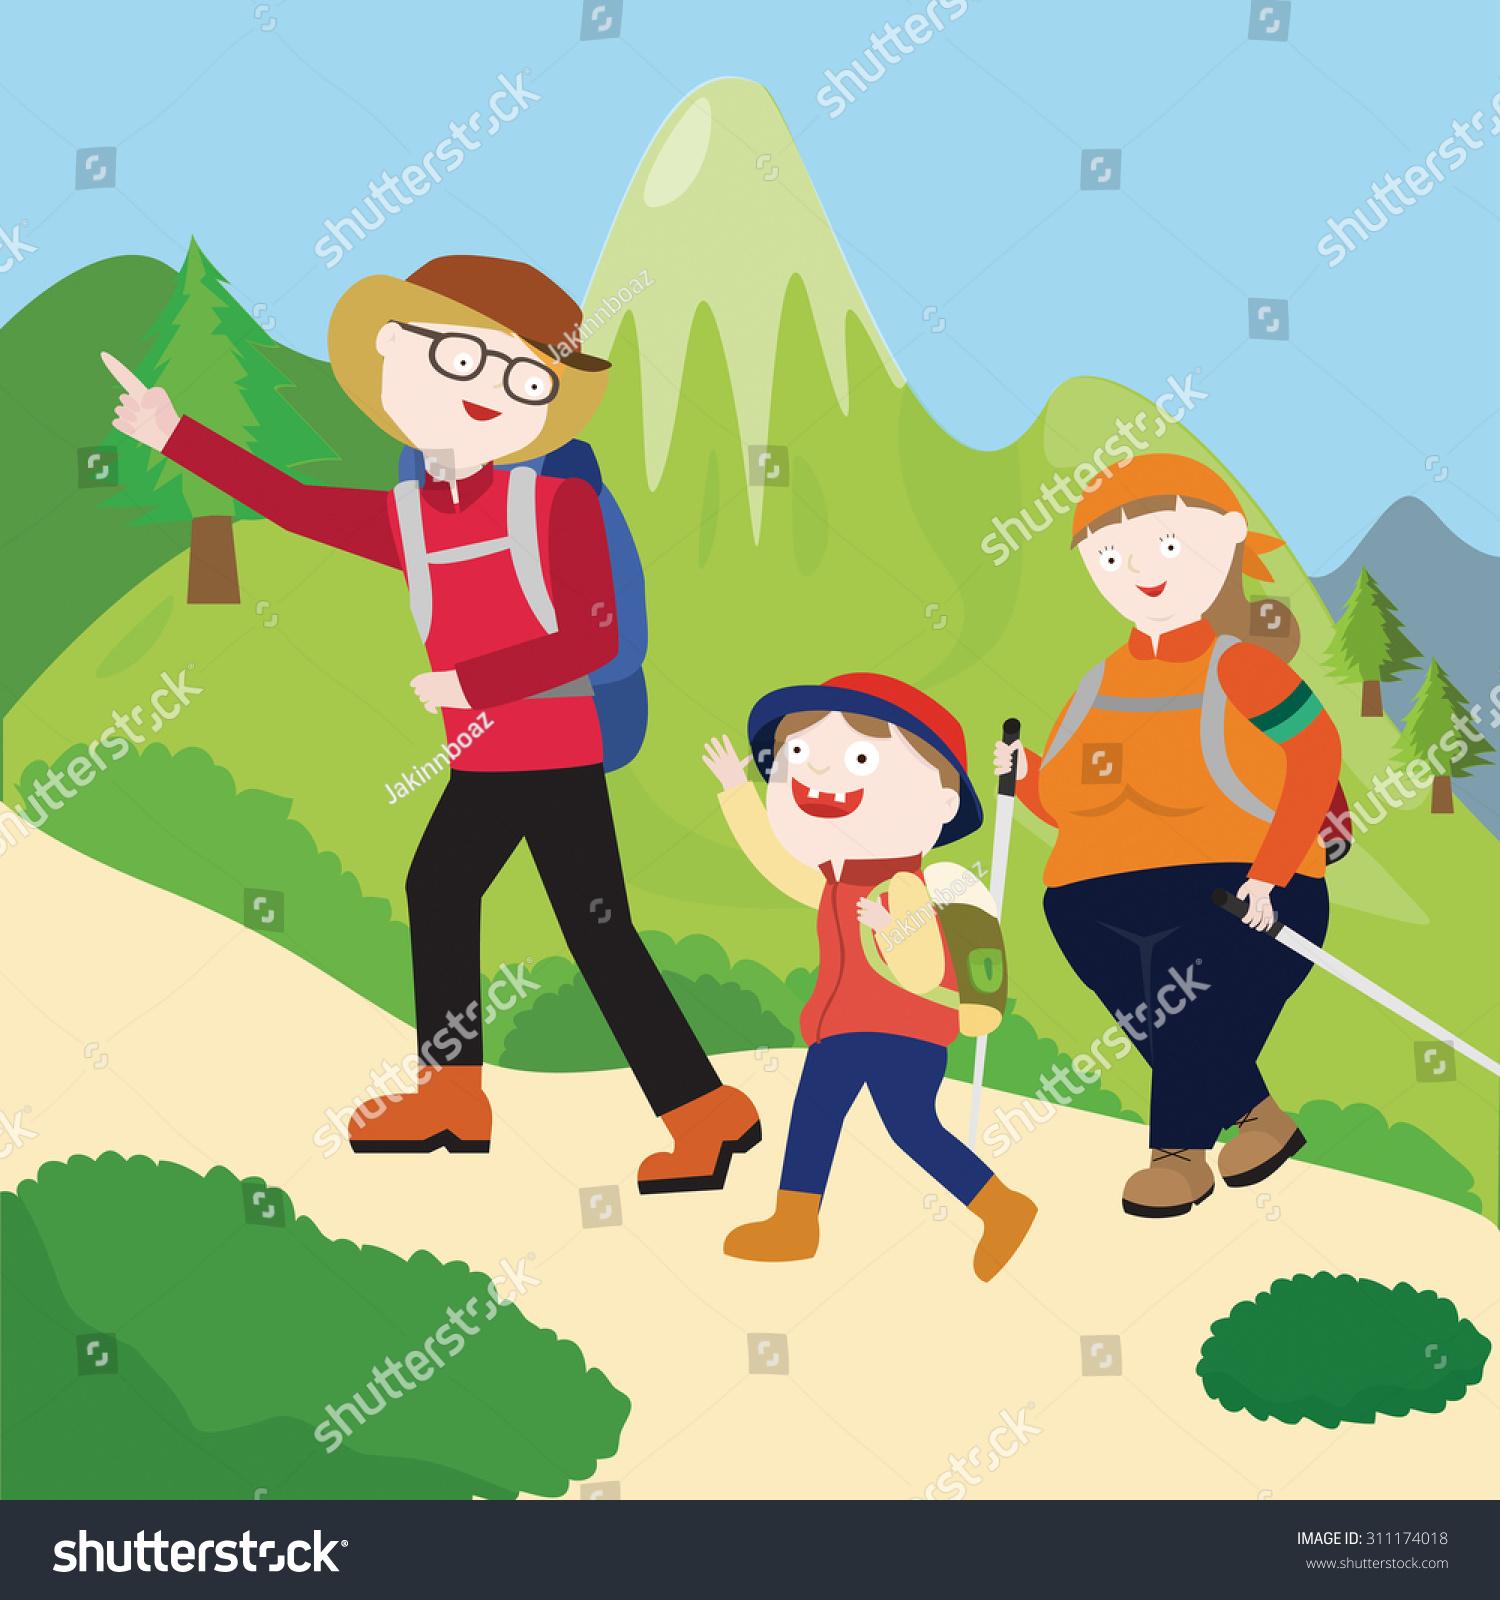 family hiking clipart - photo #25